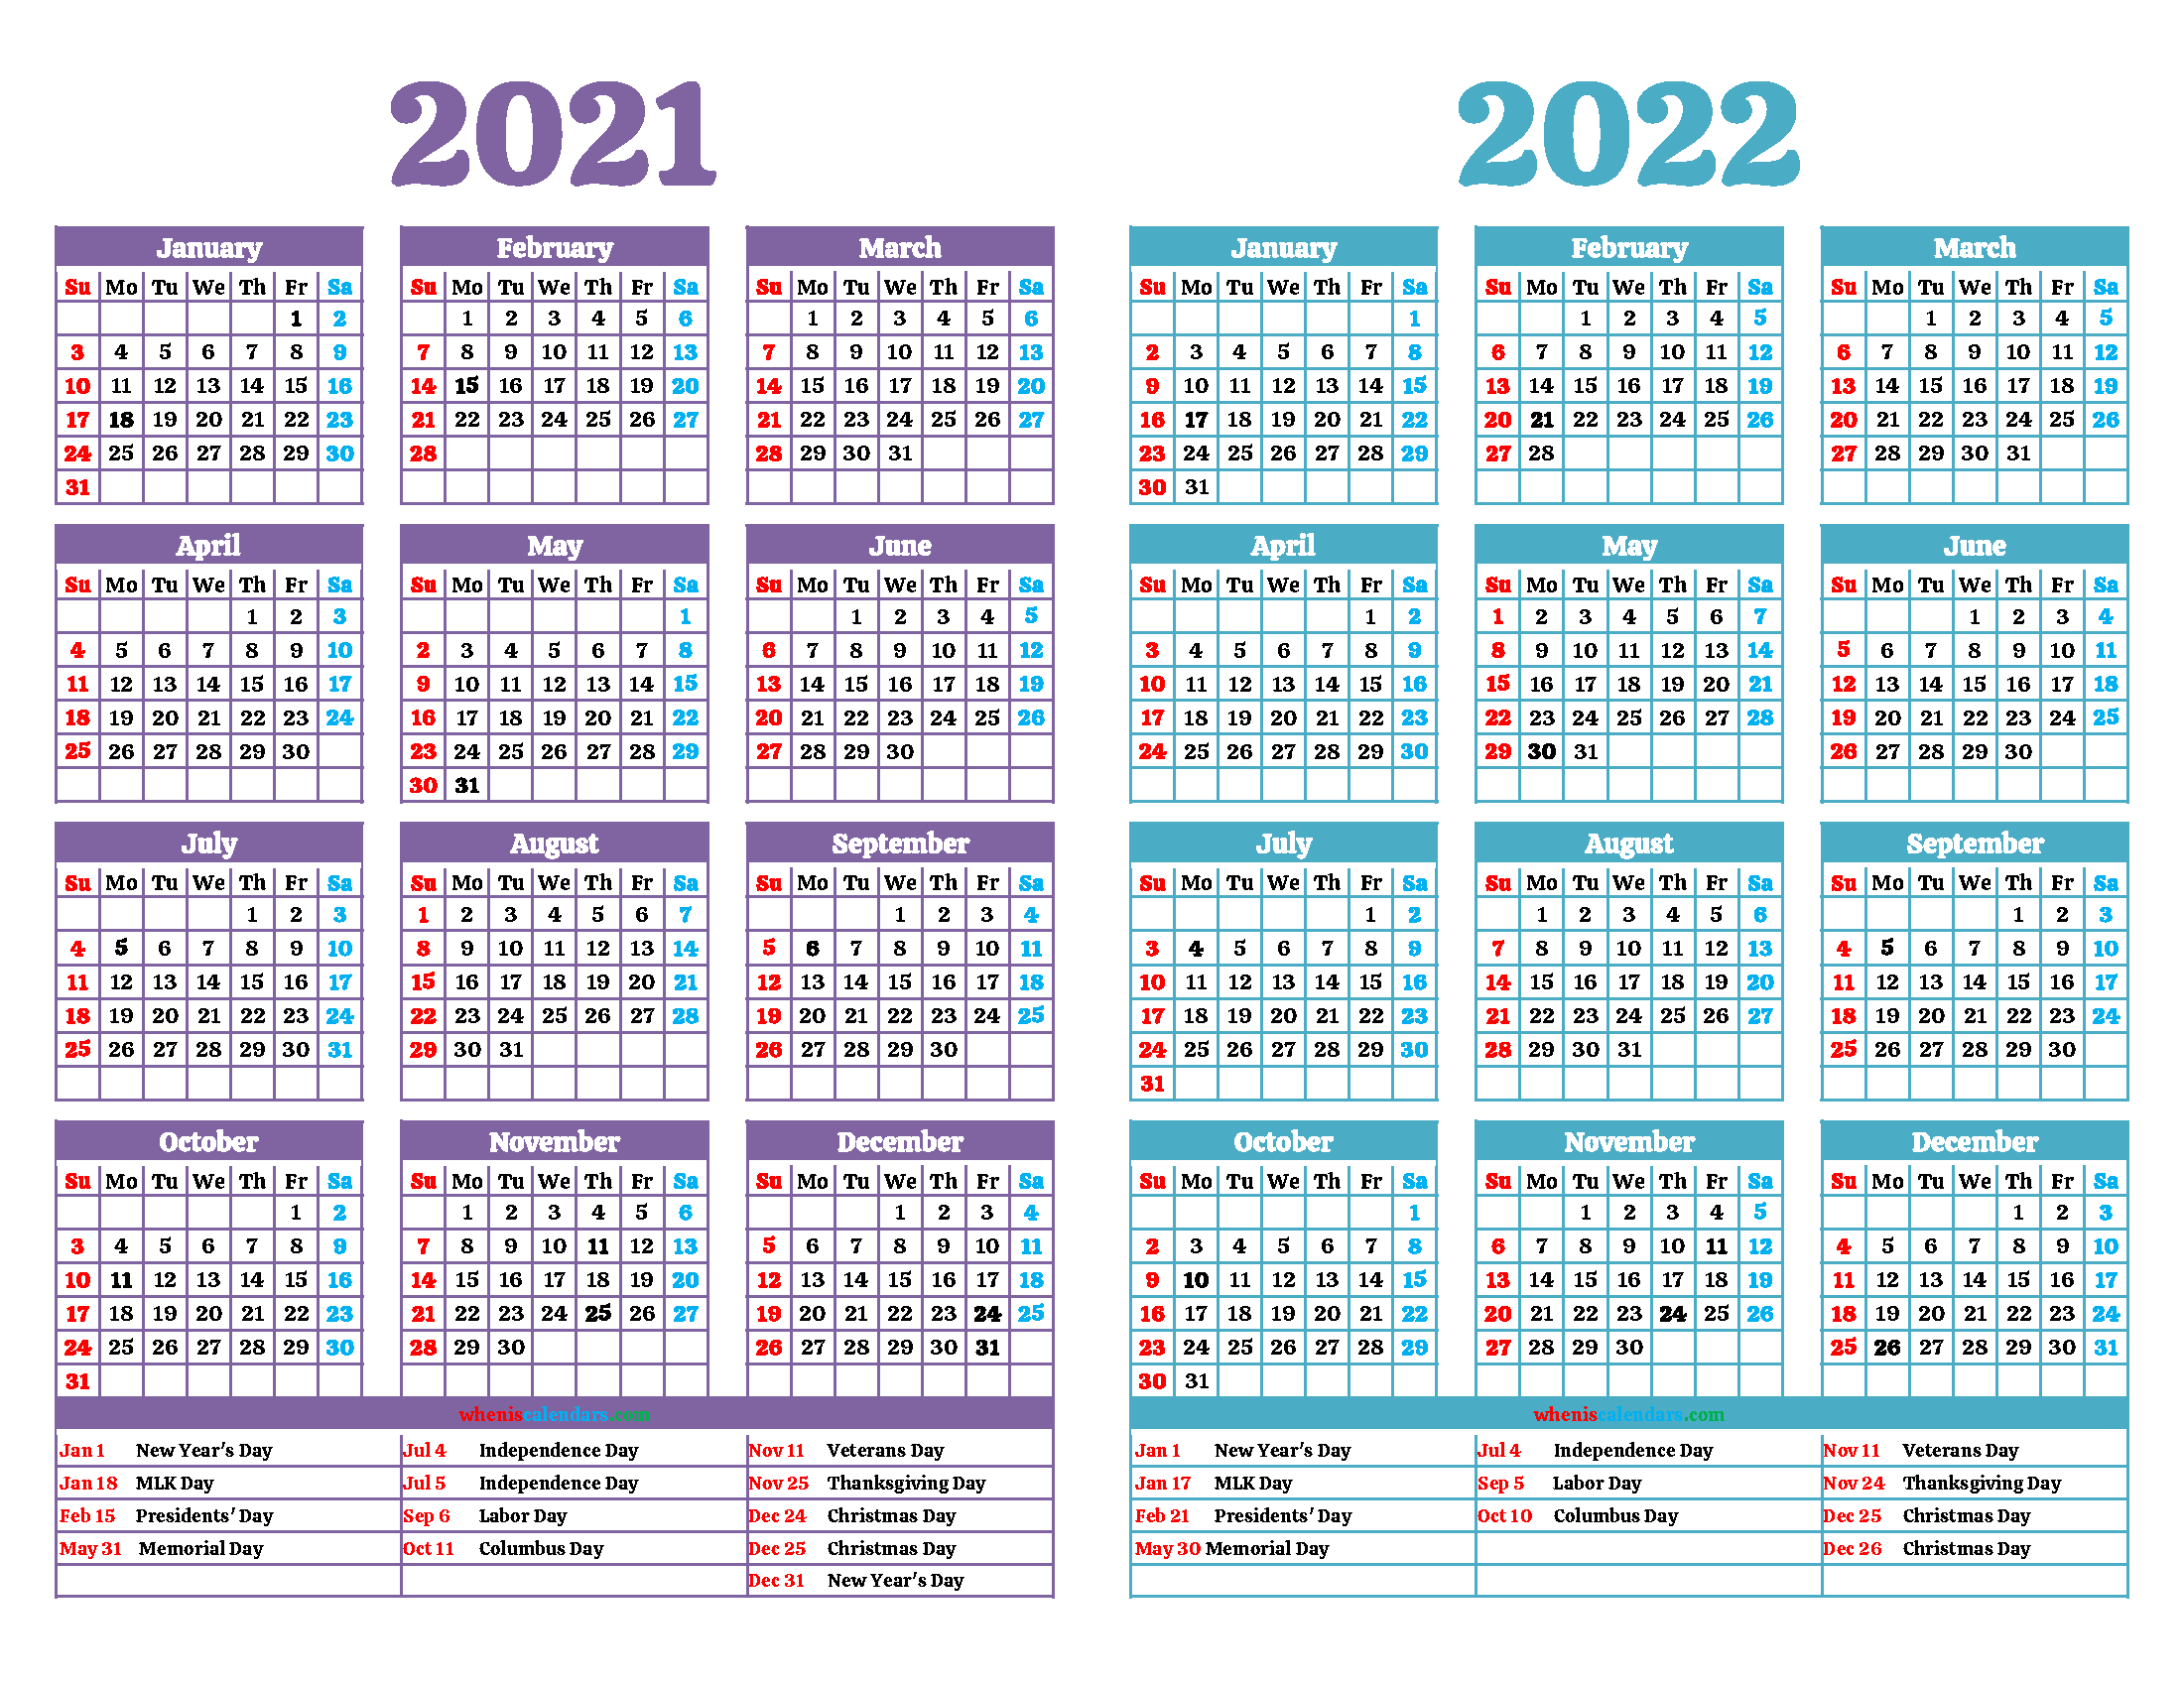 Printable 2021 and 2022 Calendar with Holidays